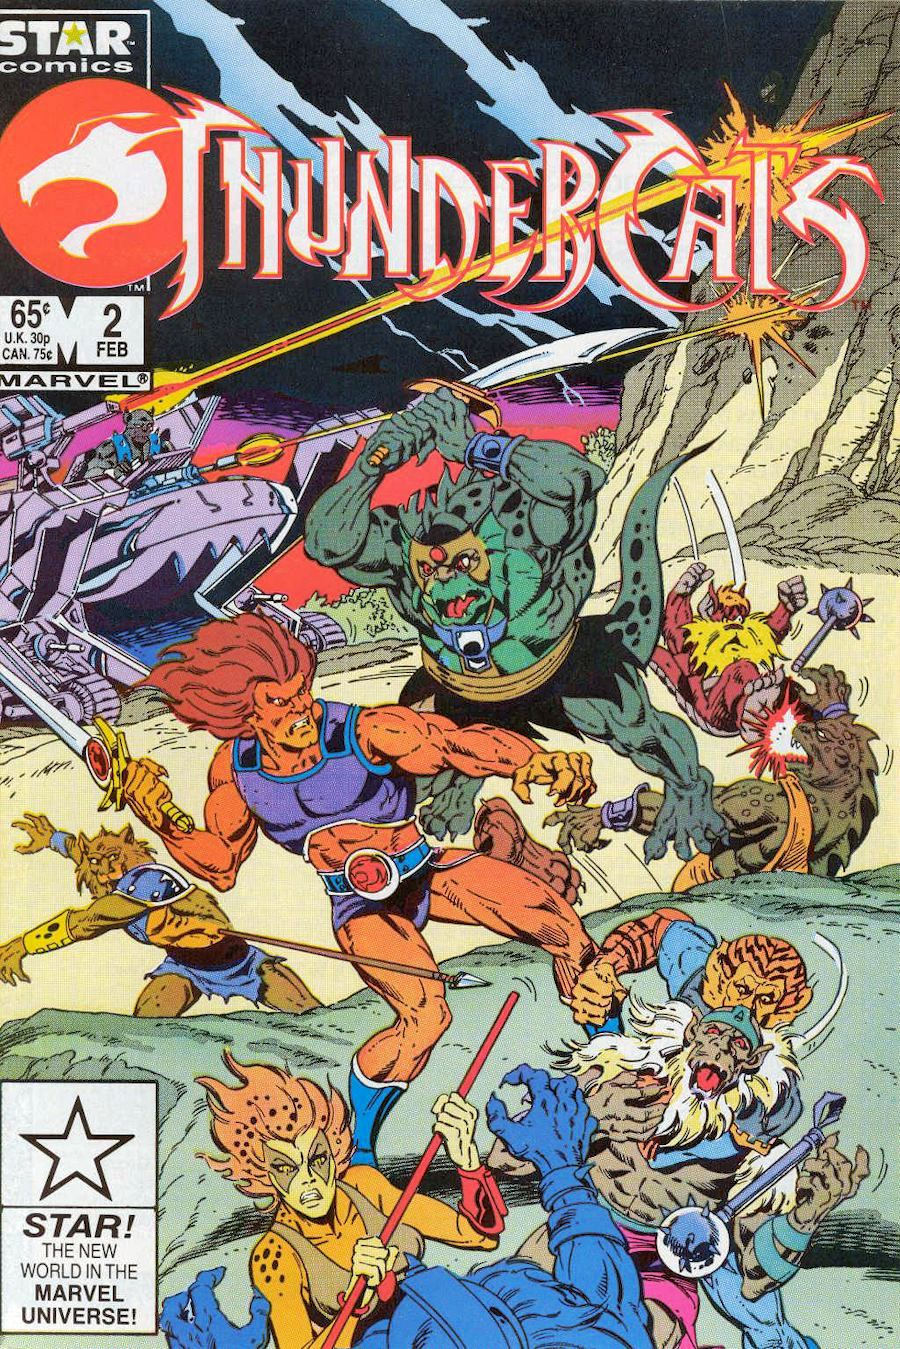 ThunderCats Vol 1 2